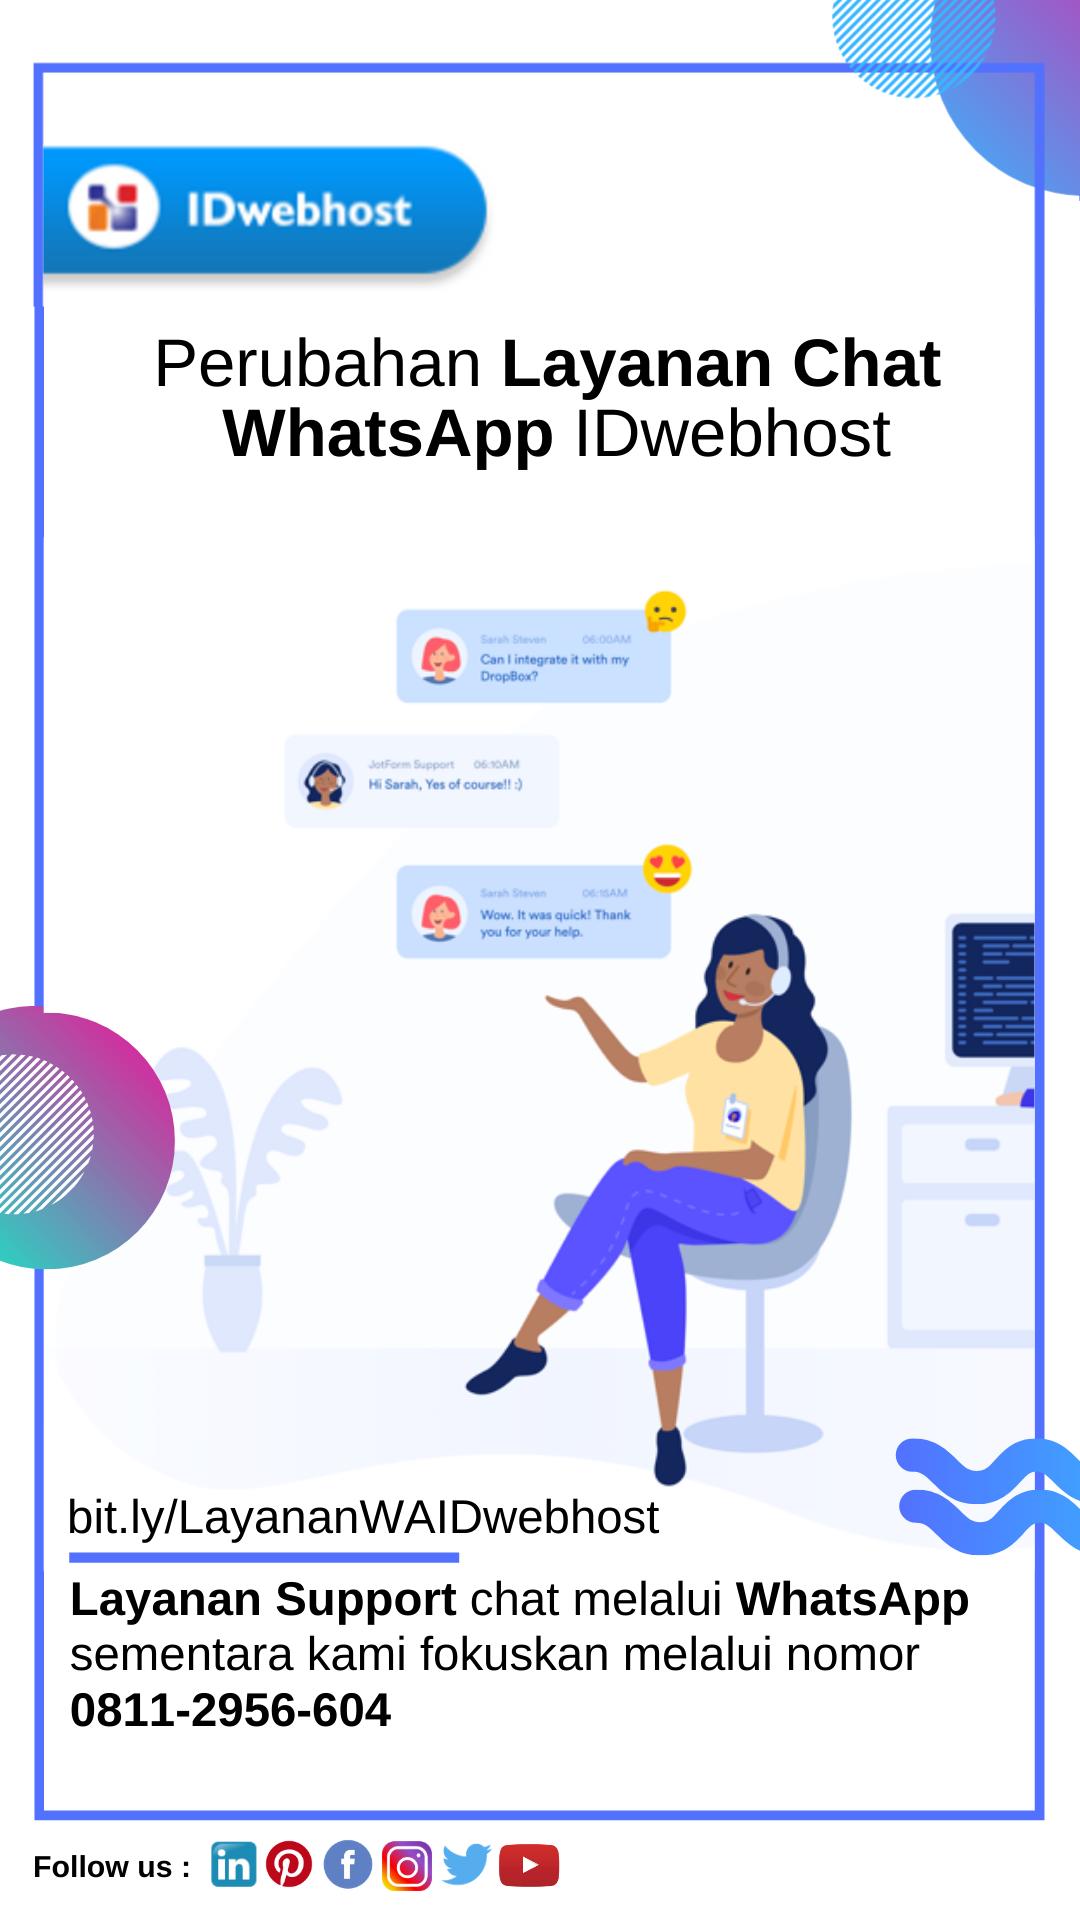 Perubahan Layanan Chat Whatsapp Idwebhost Pelayan